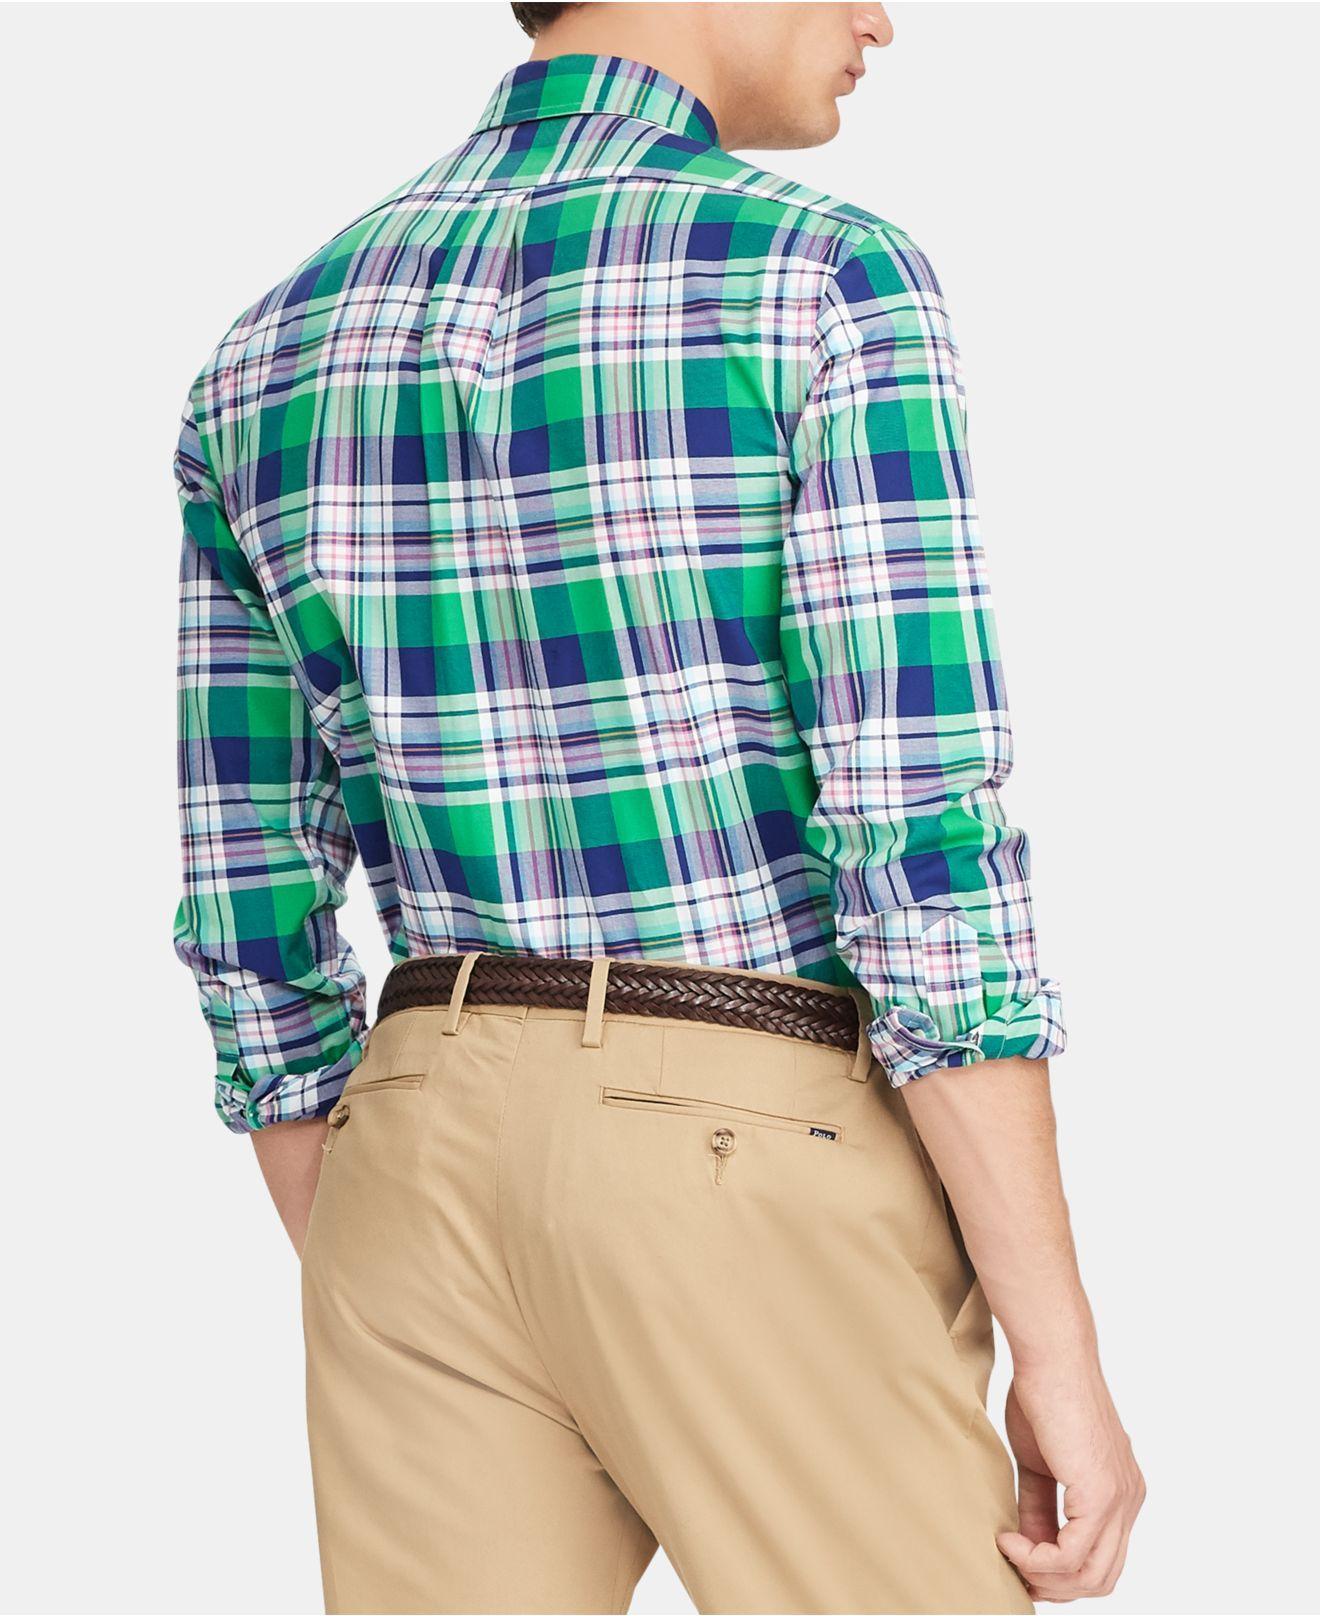 c7d11682 ... get lyst polo ralph lauren plaid slim fit button down oxford shirt in  blue for men